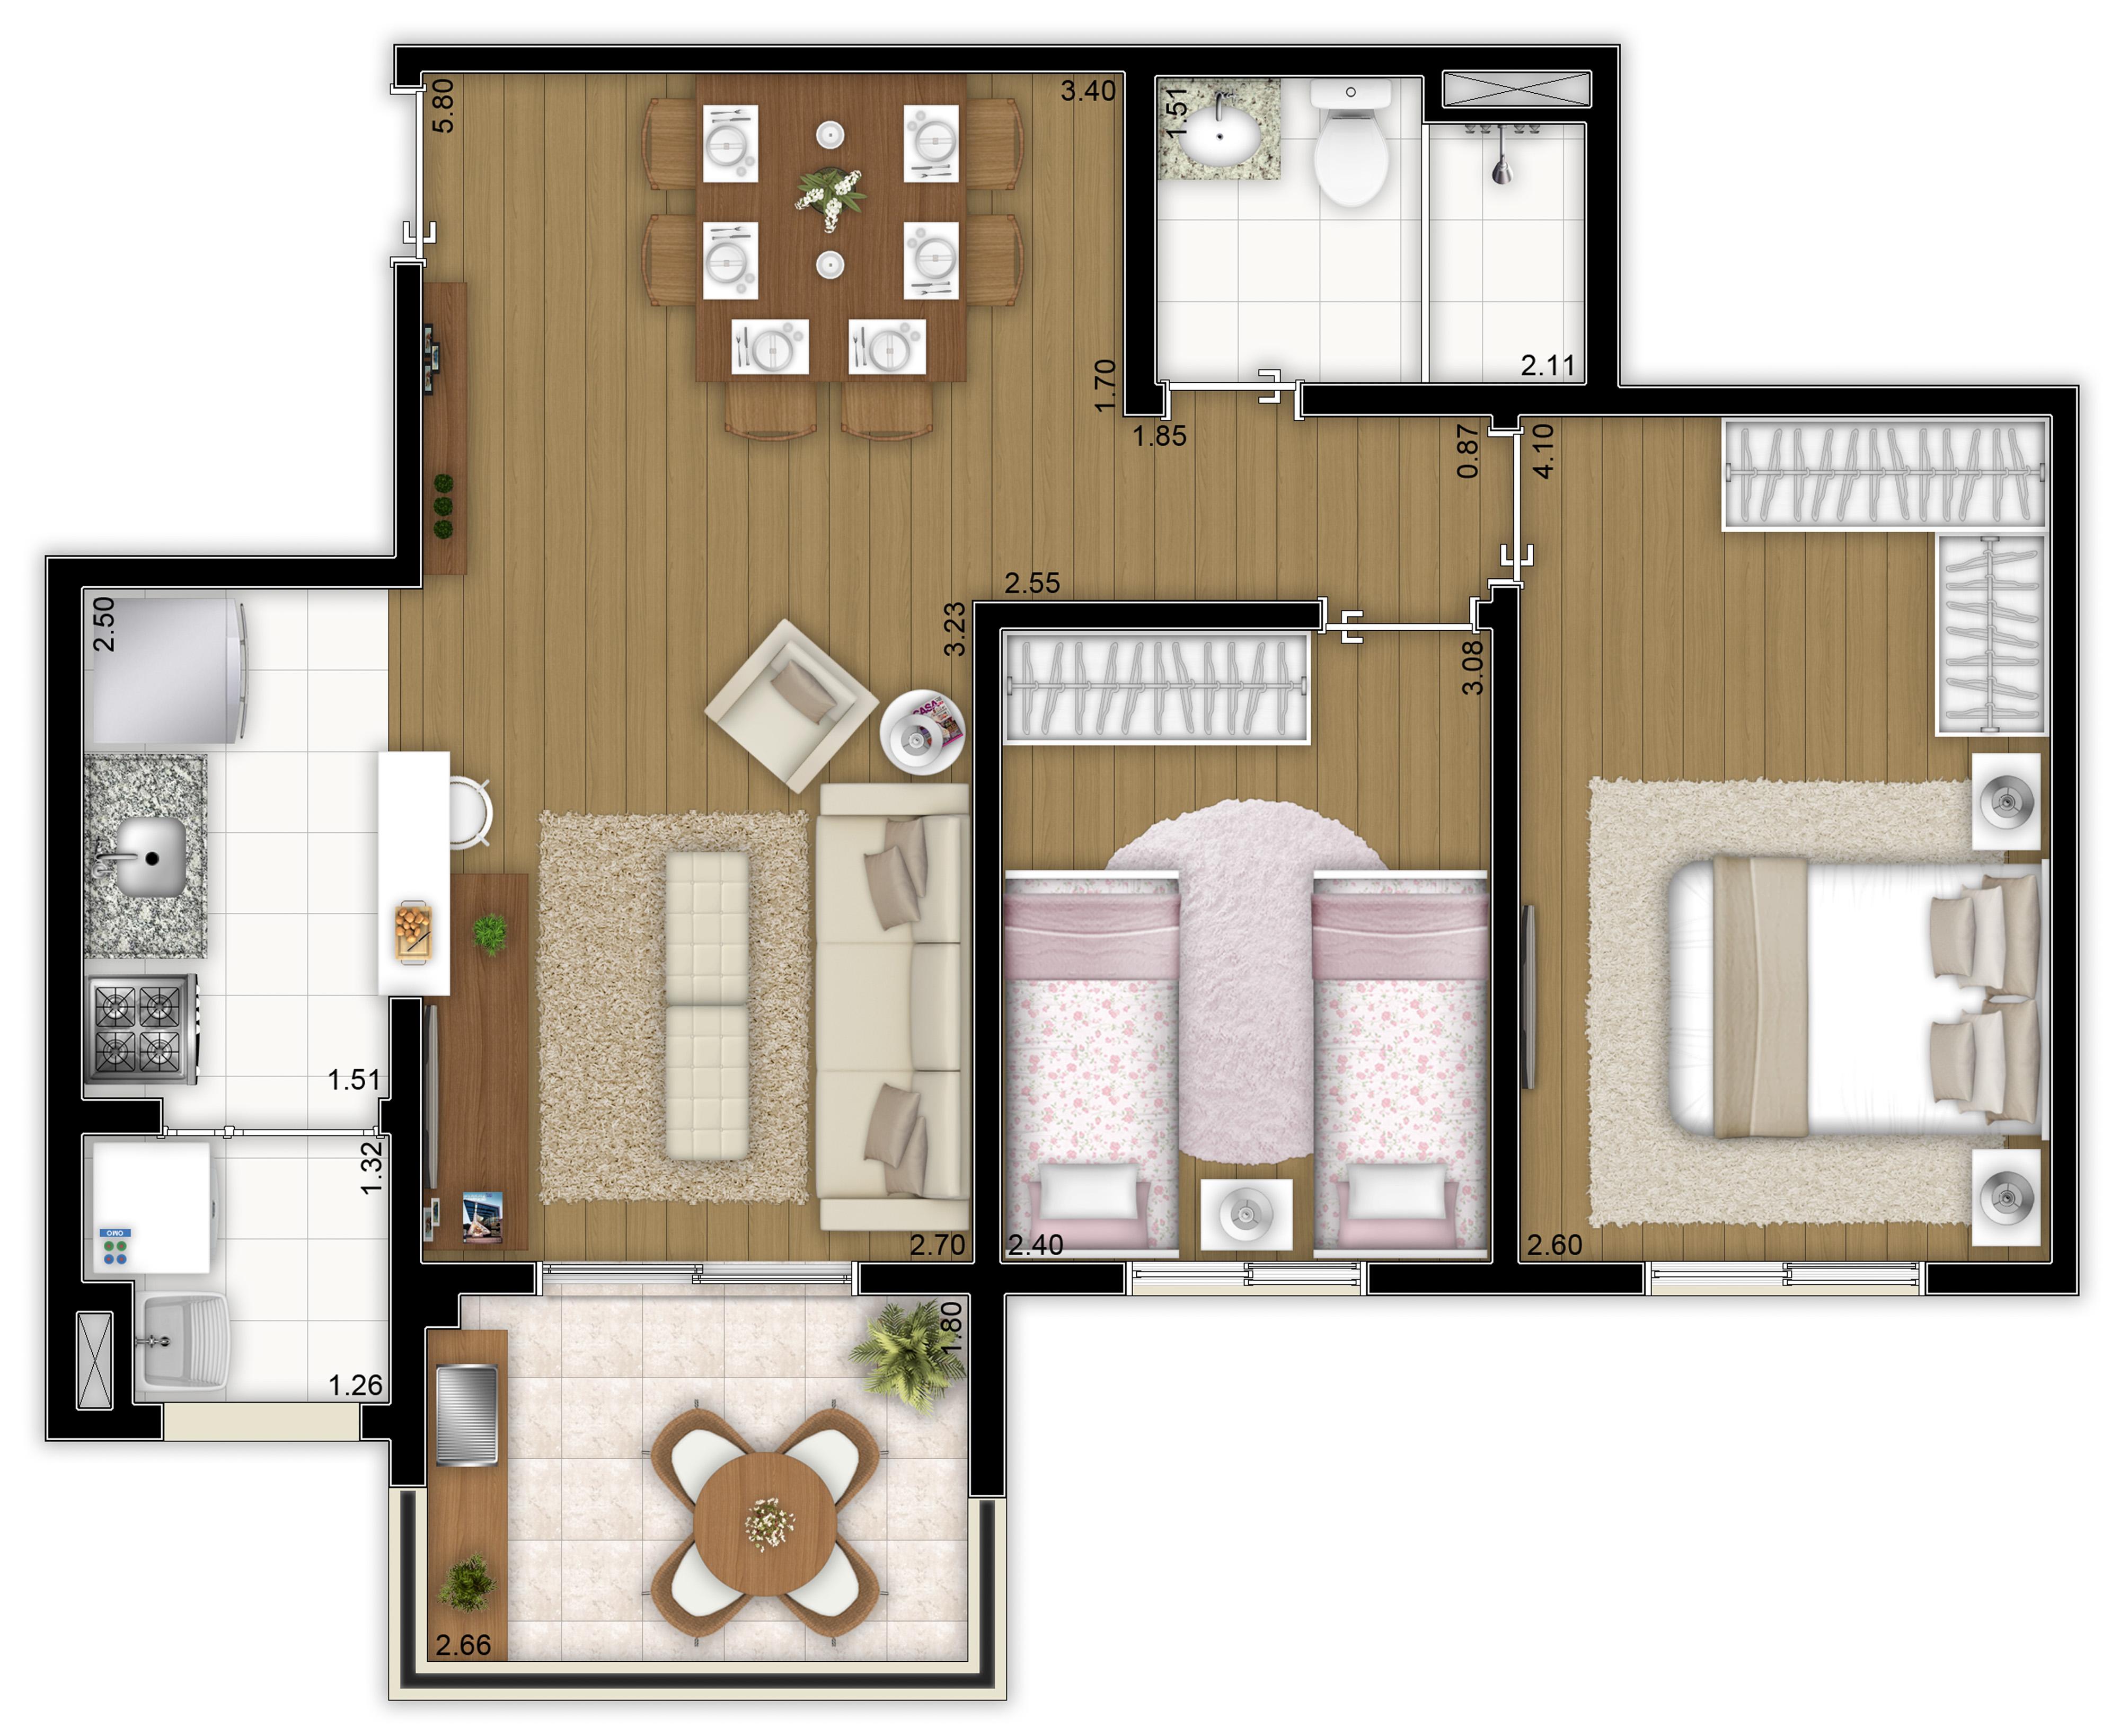 60m² - 2 dorms